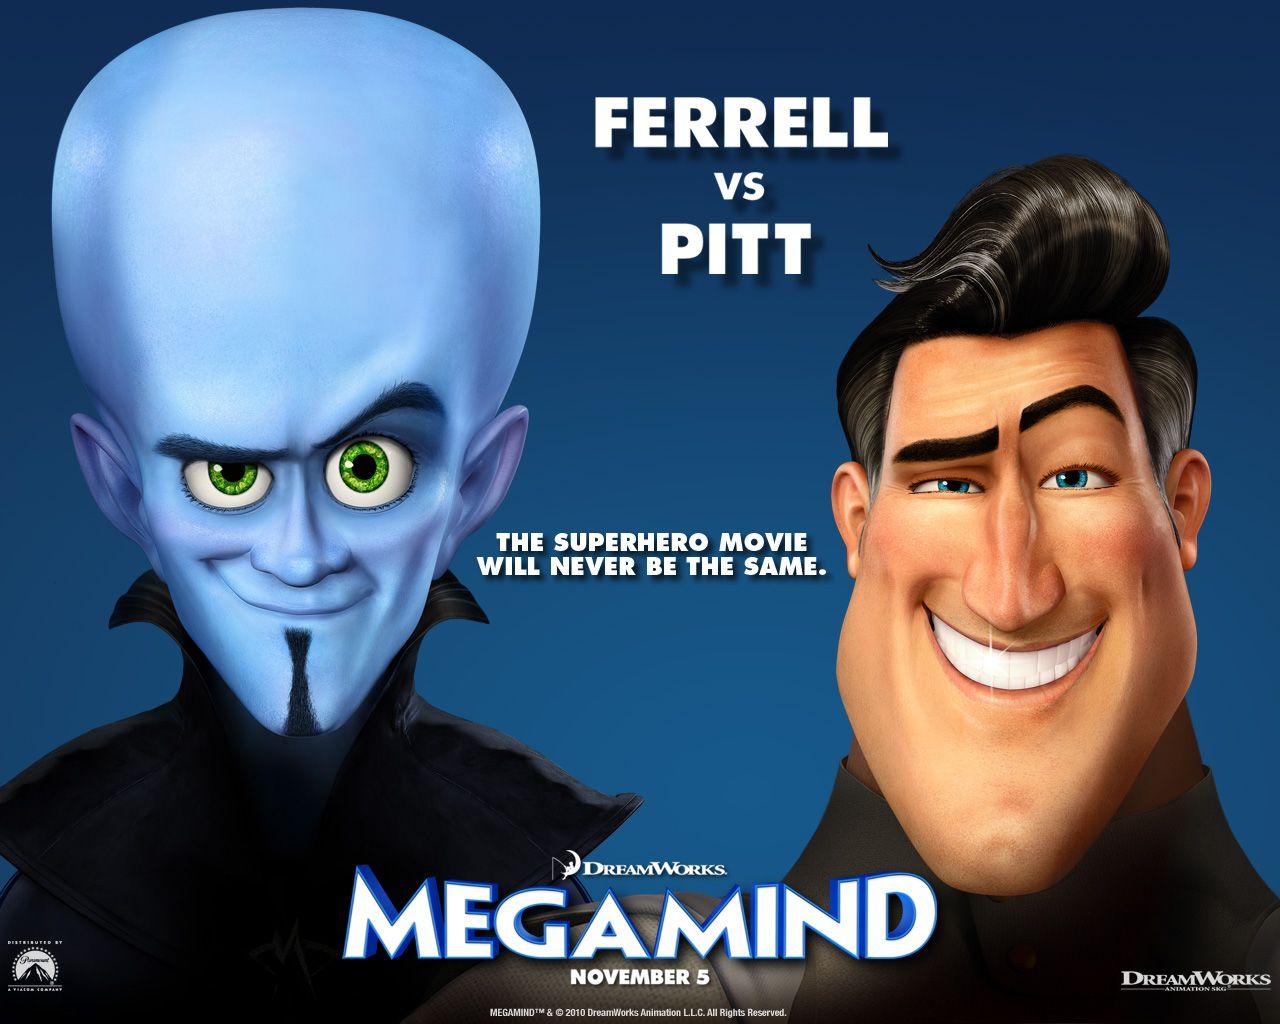 1000  images about Megamind on Pinterest | Brad pitt, Vinyls and ...